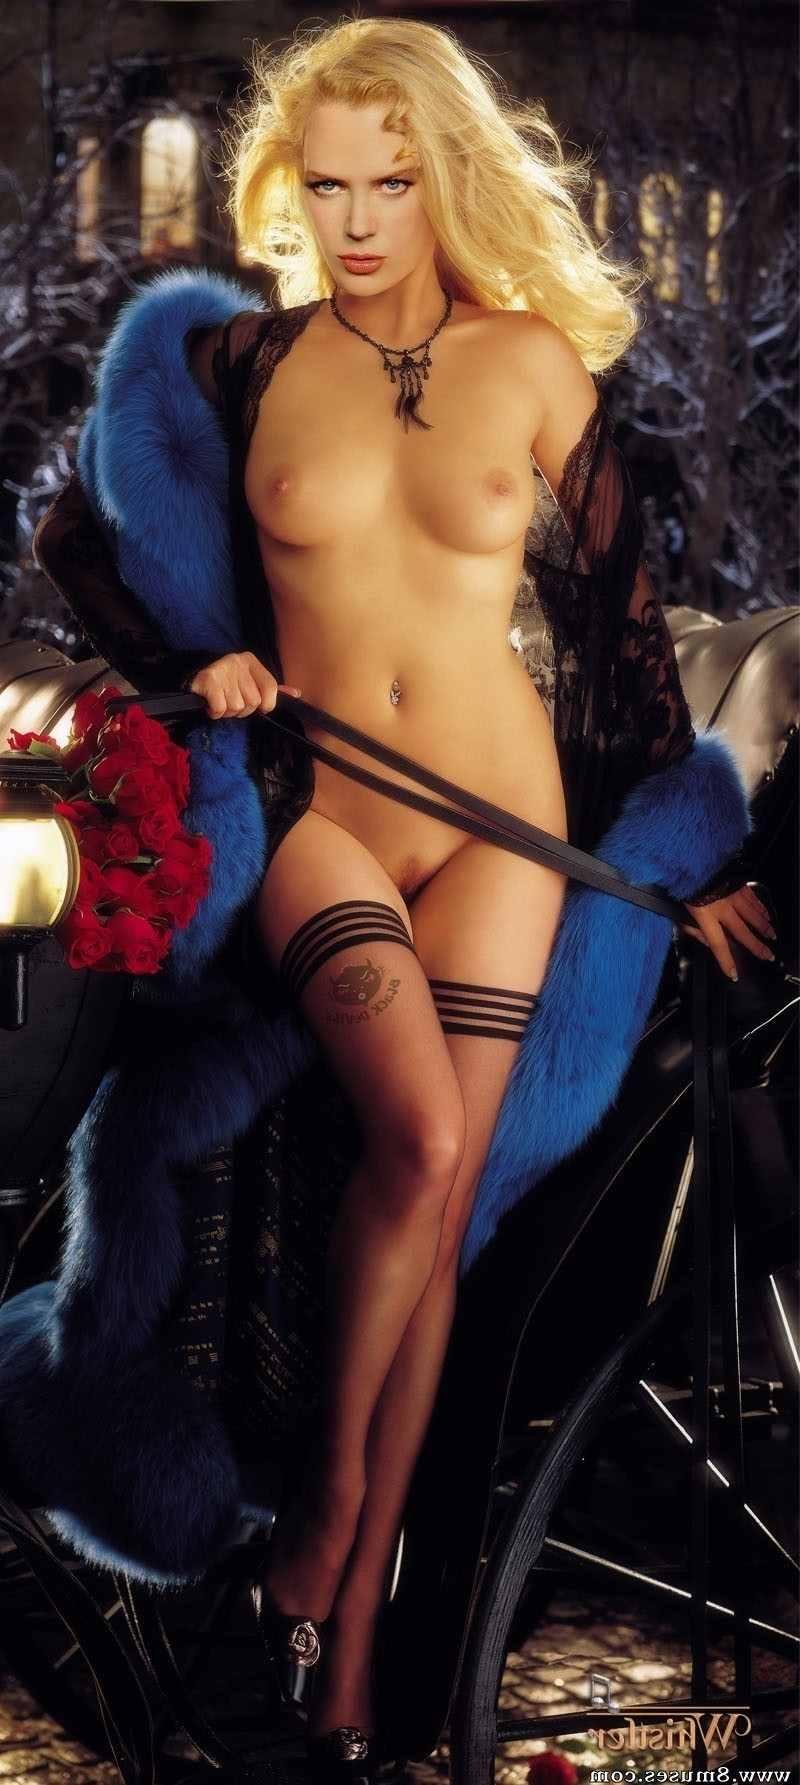 Fake-Celebrities-Sex-Pictures/Nicole-Kidman Nicole_Kidman__8muses_-_Sex_and_Porn_Comics_23.jpg